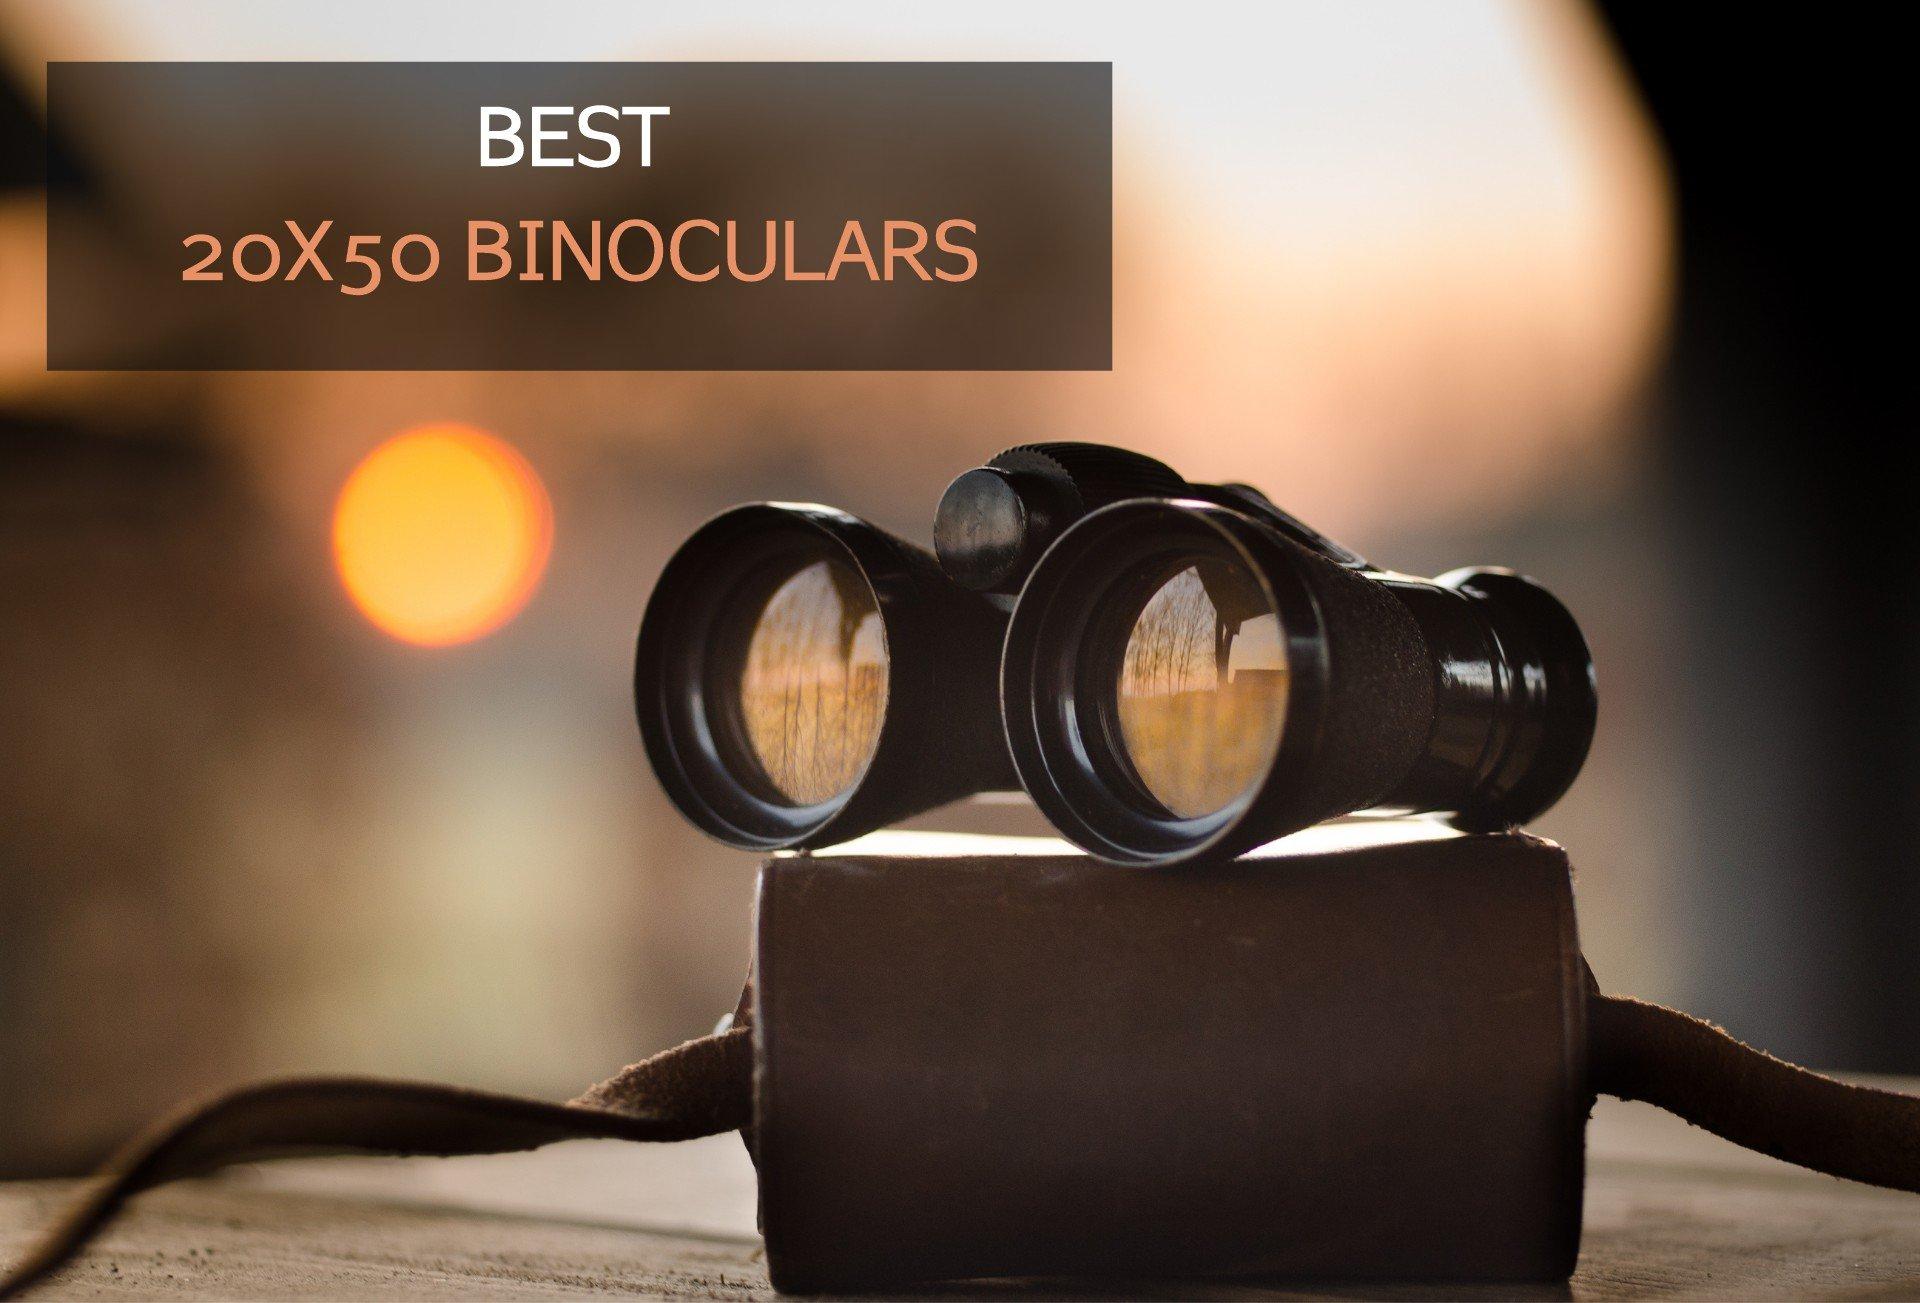 best 20x50 binoculars